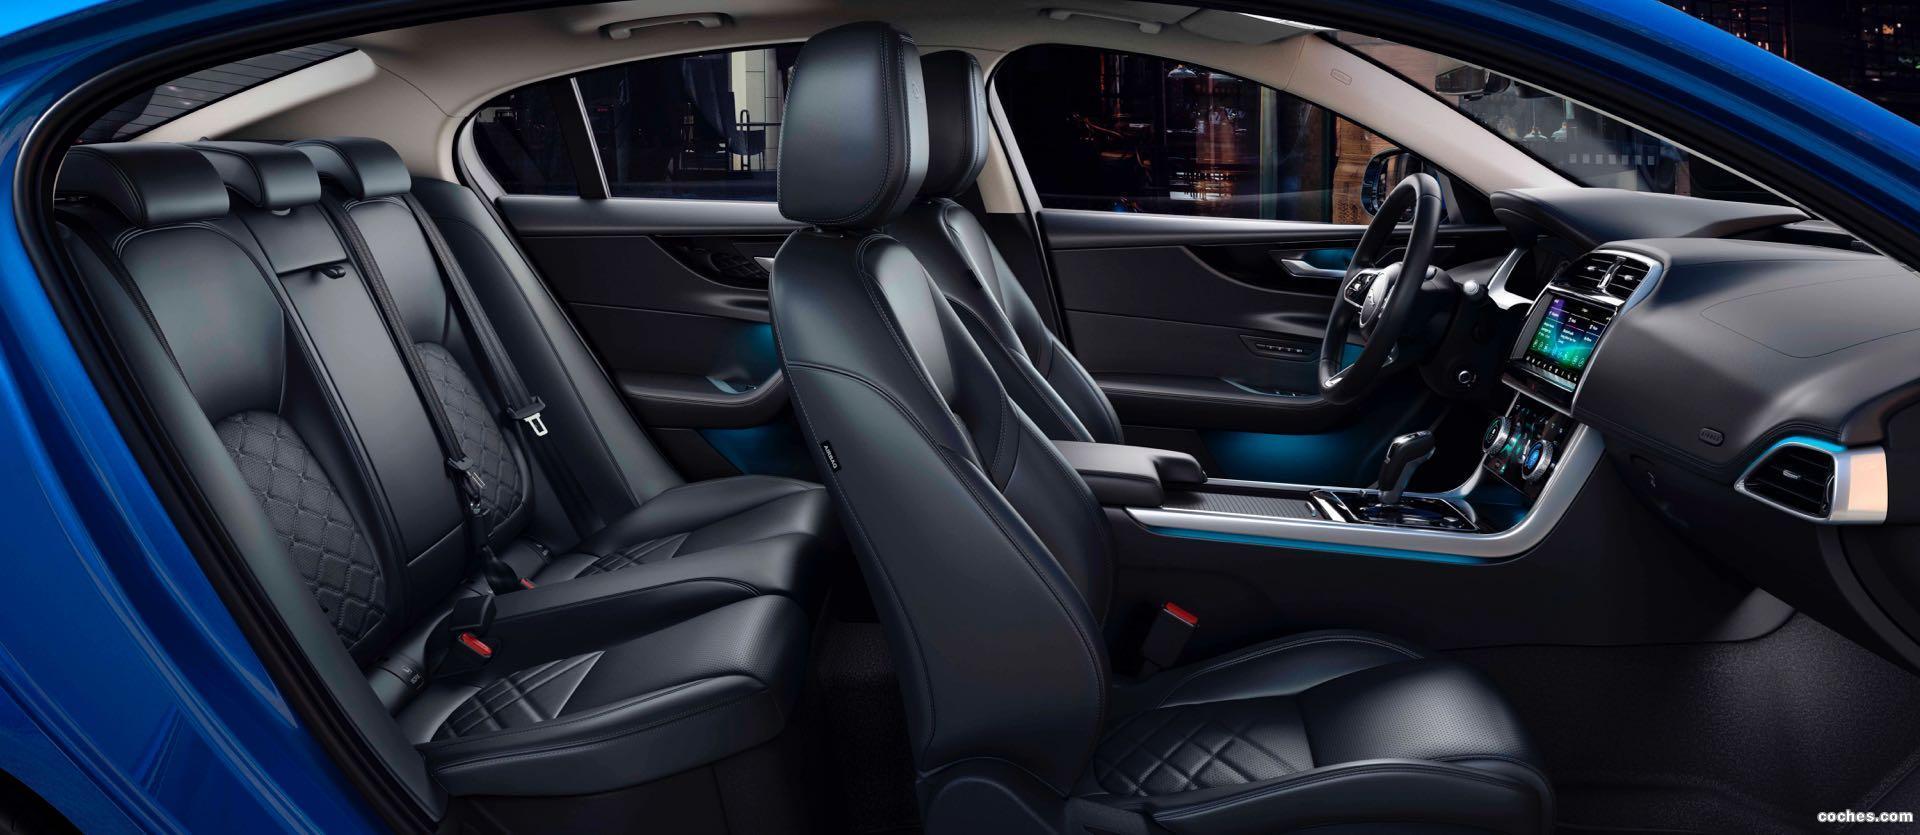 Foto 17 de Jaguar XE D180 HSE 2019